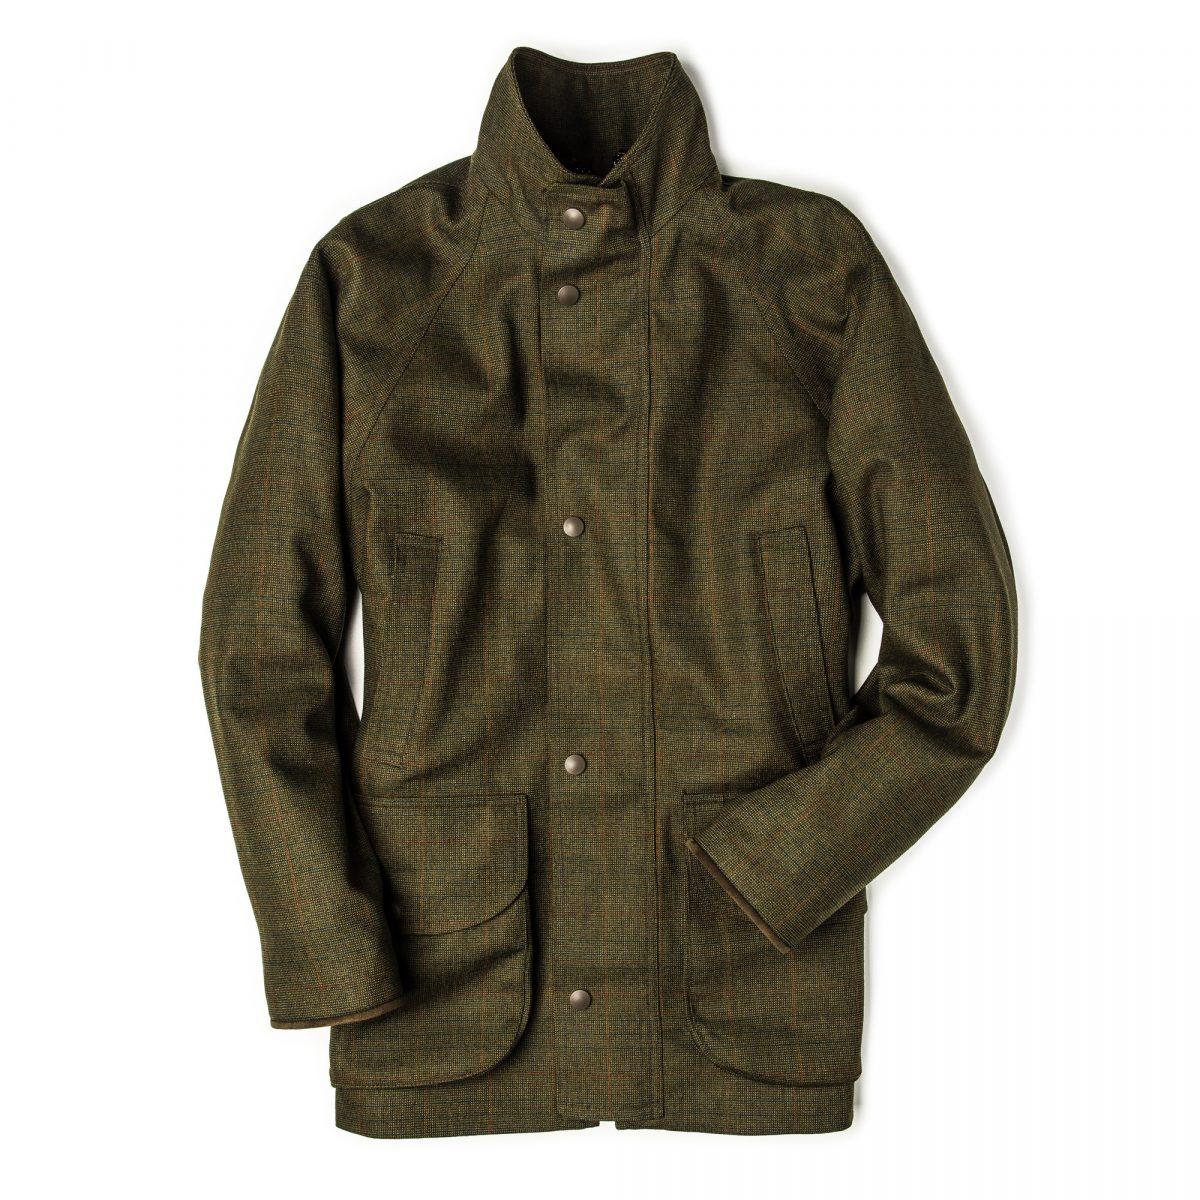 wr_co_tweed_shooting_jacket-8973-edit